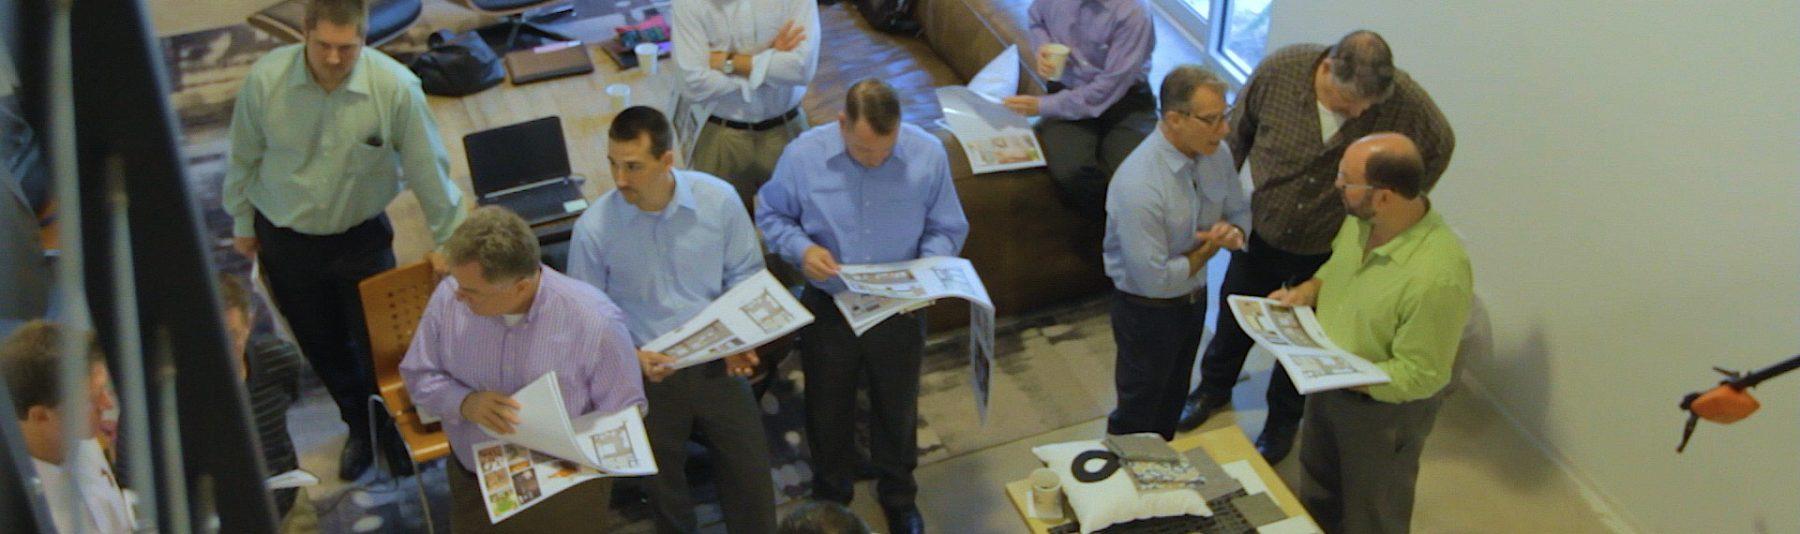 Mainsail Lodging & Development employees meeting